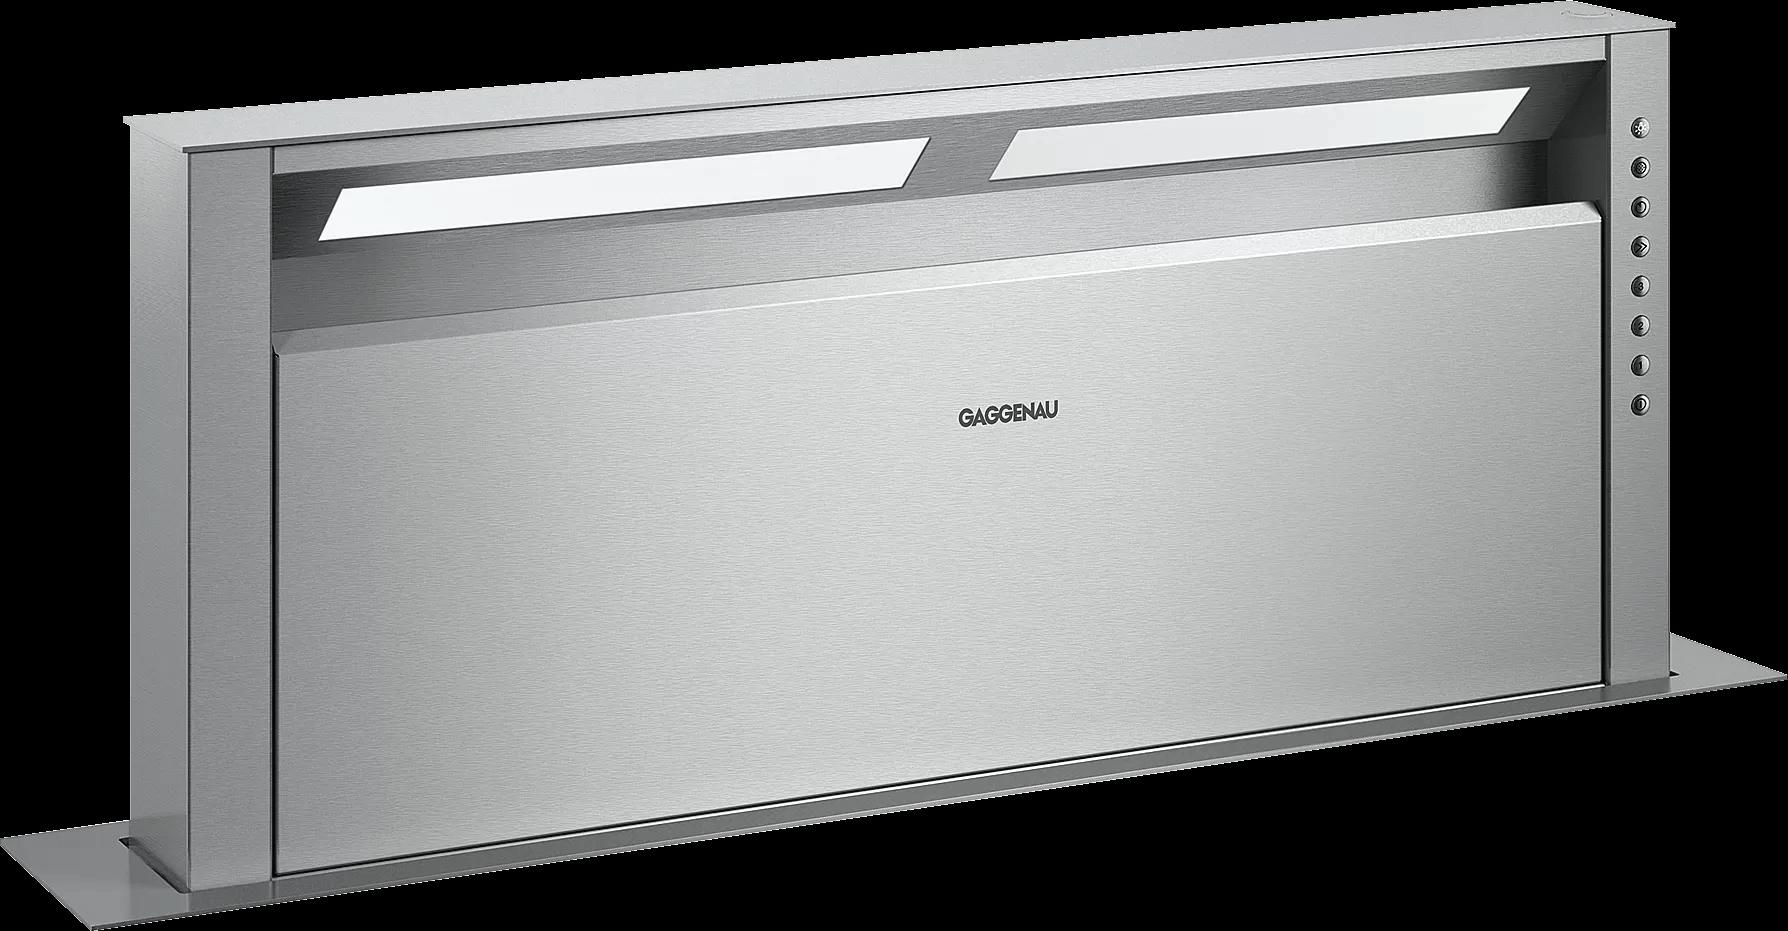 Gaggenau400 Series Backsplash Ventilation 36'' Stainless Steel